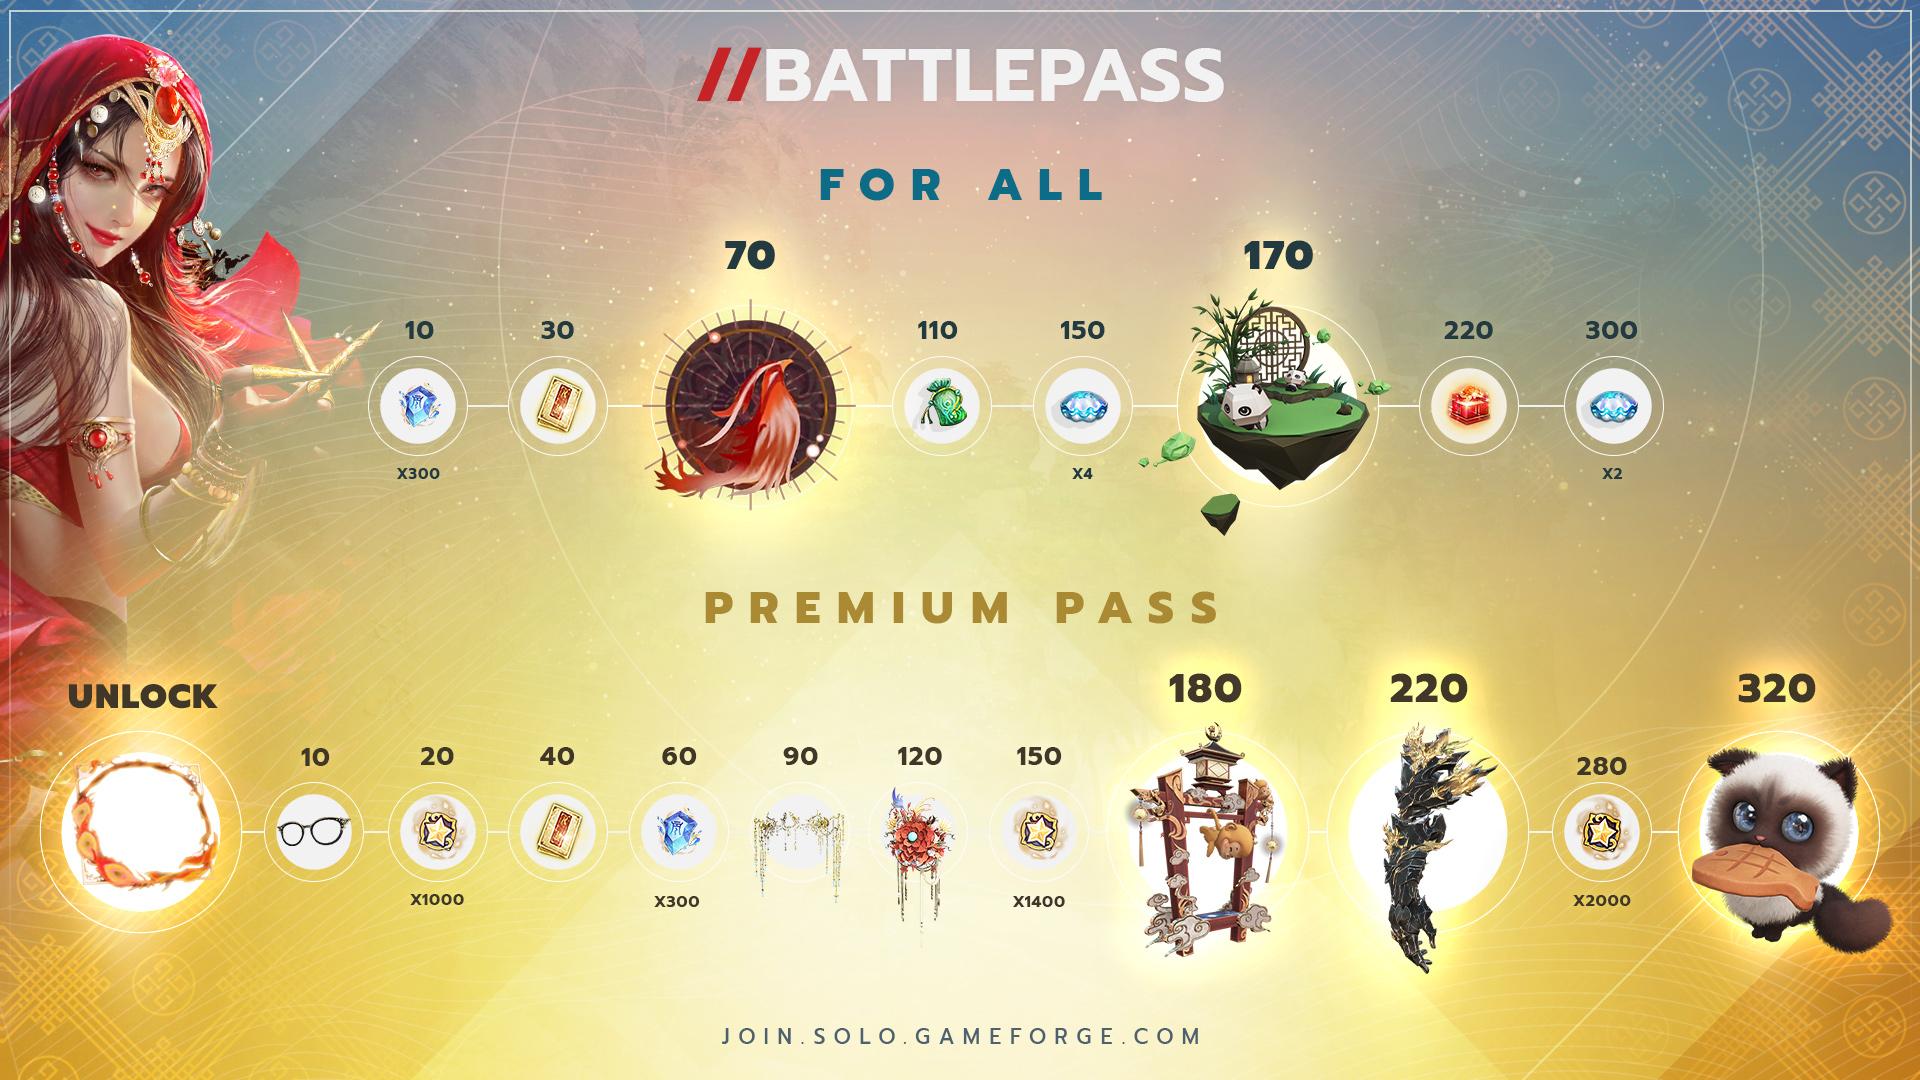 SOLO_BattlePass_S2.jpg